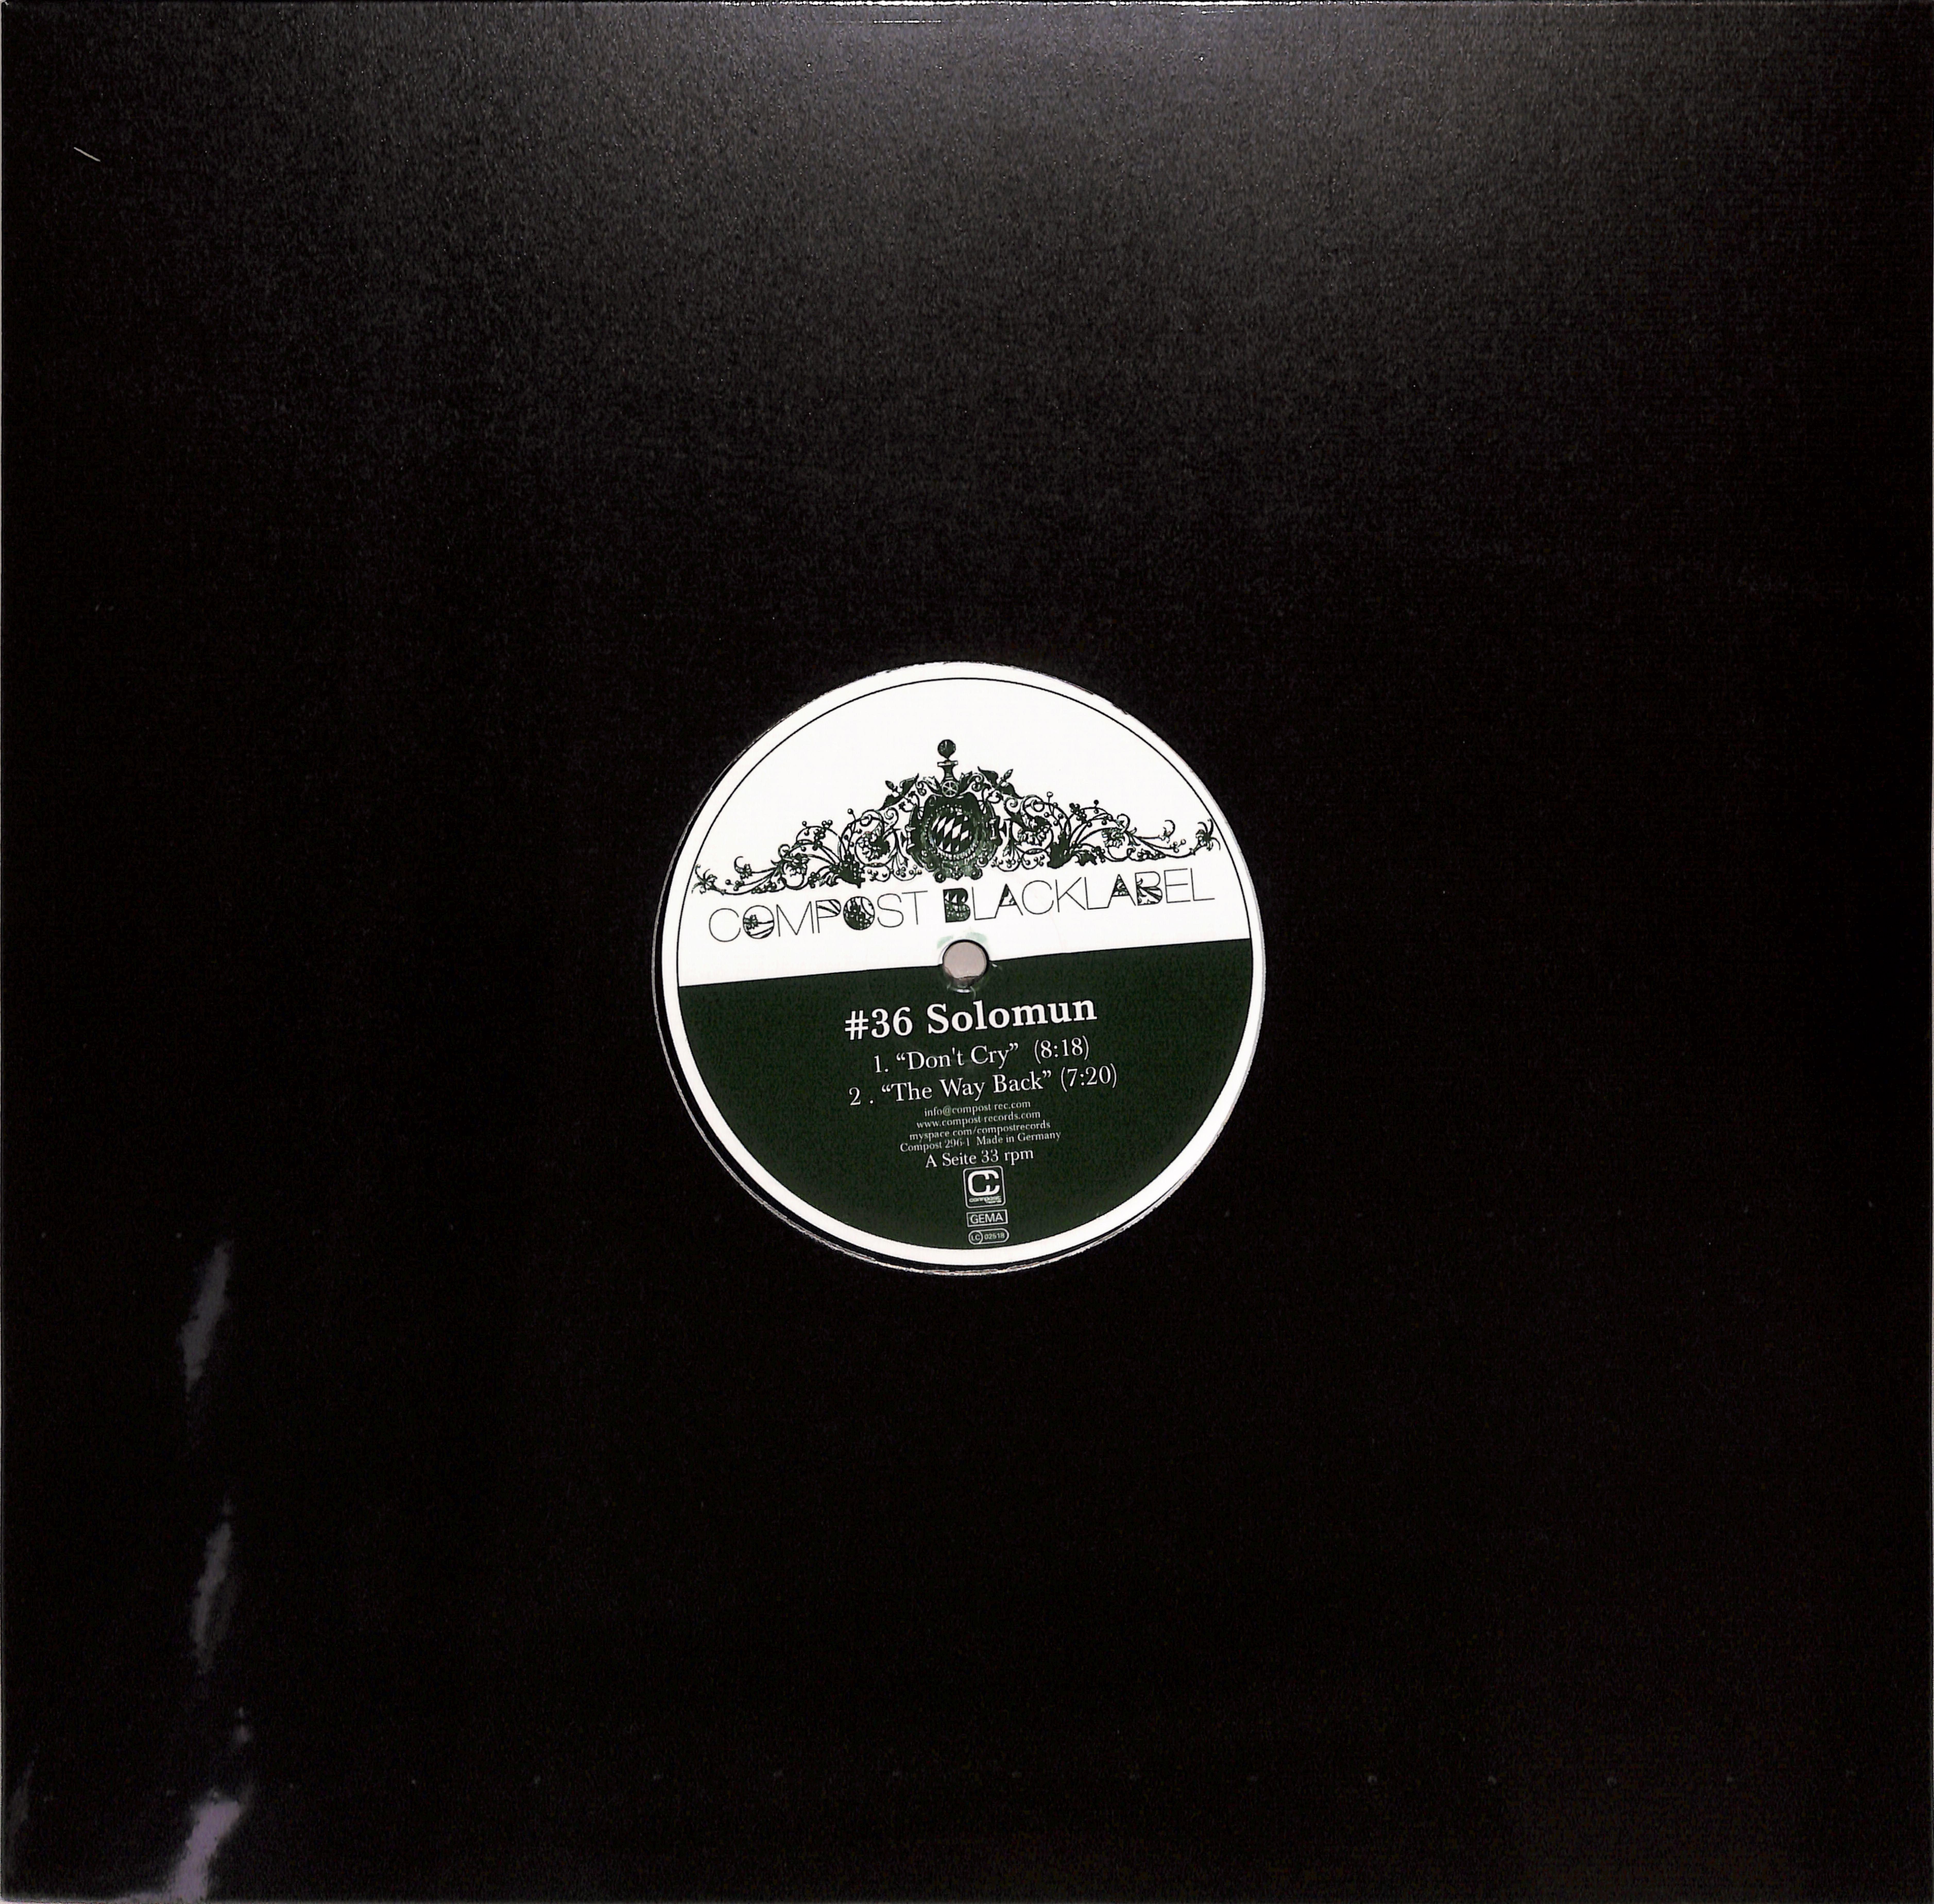 Solomun - COMPOST BLACK LABEL 36